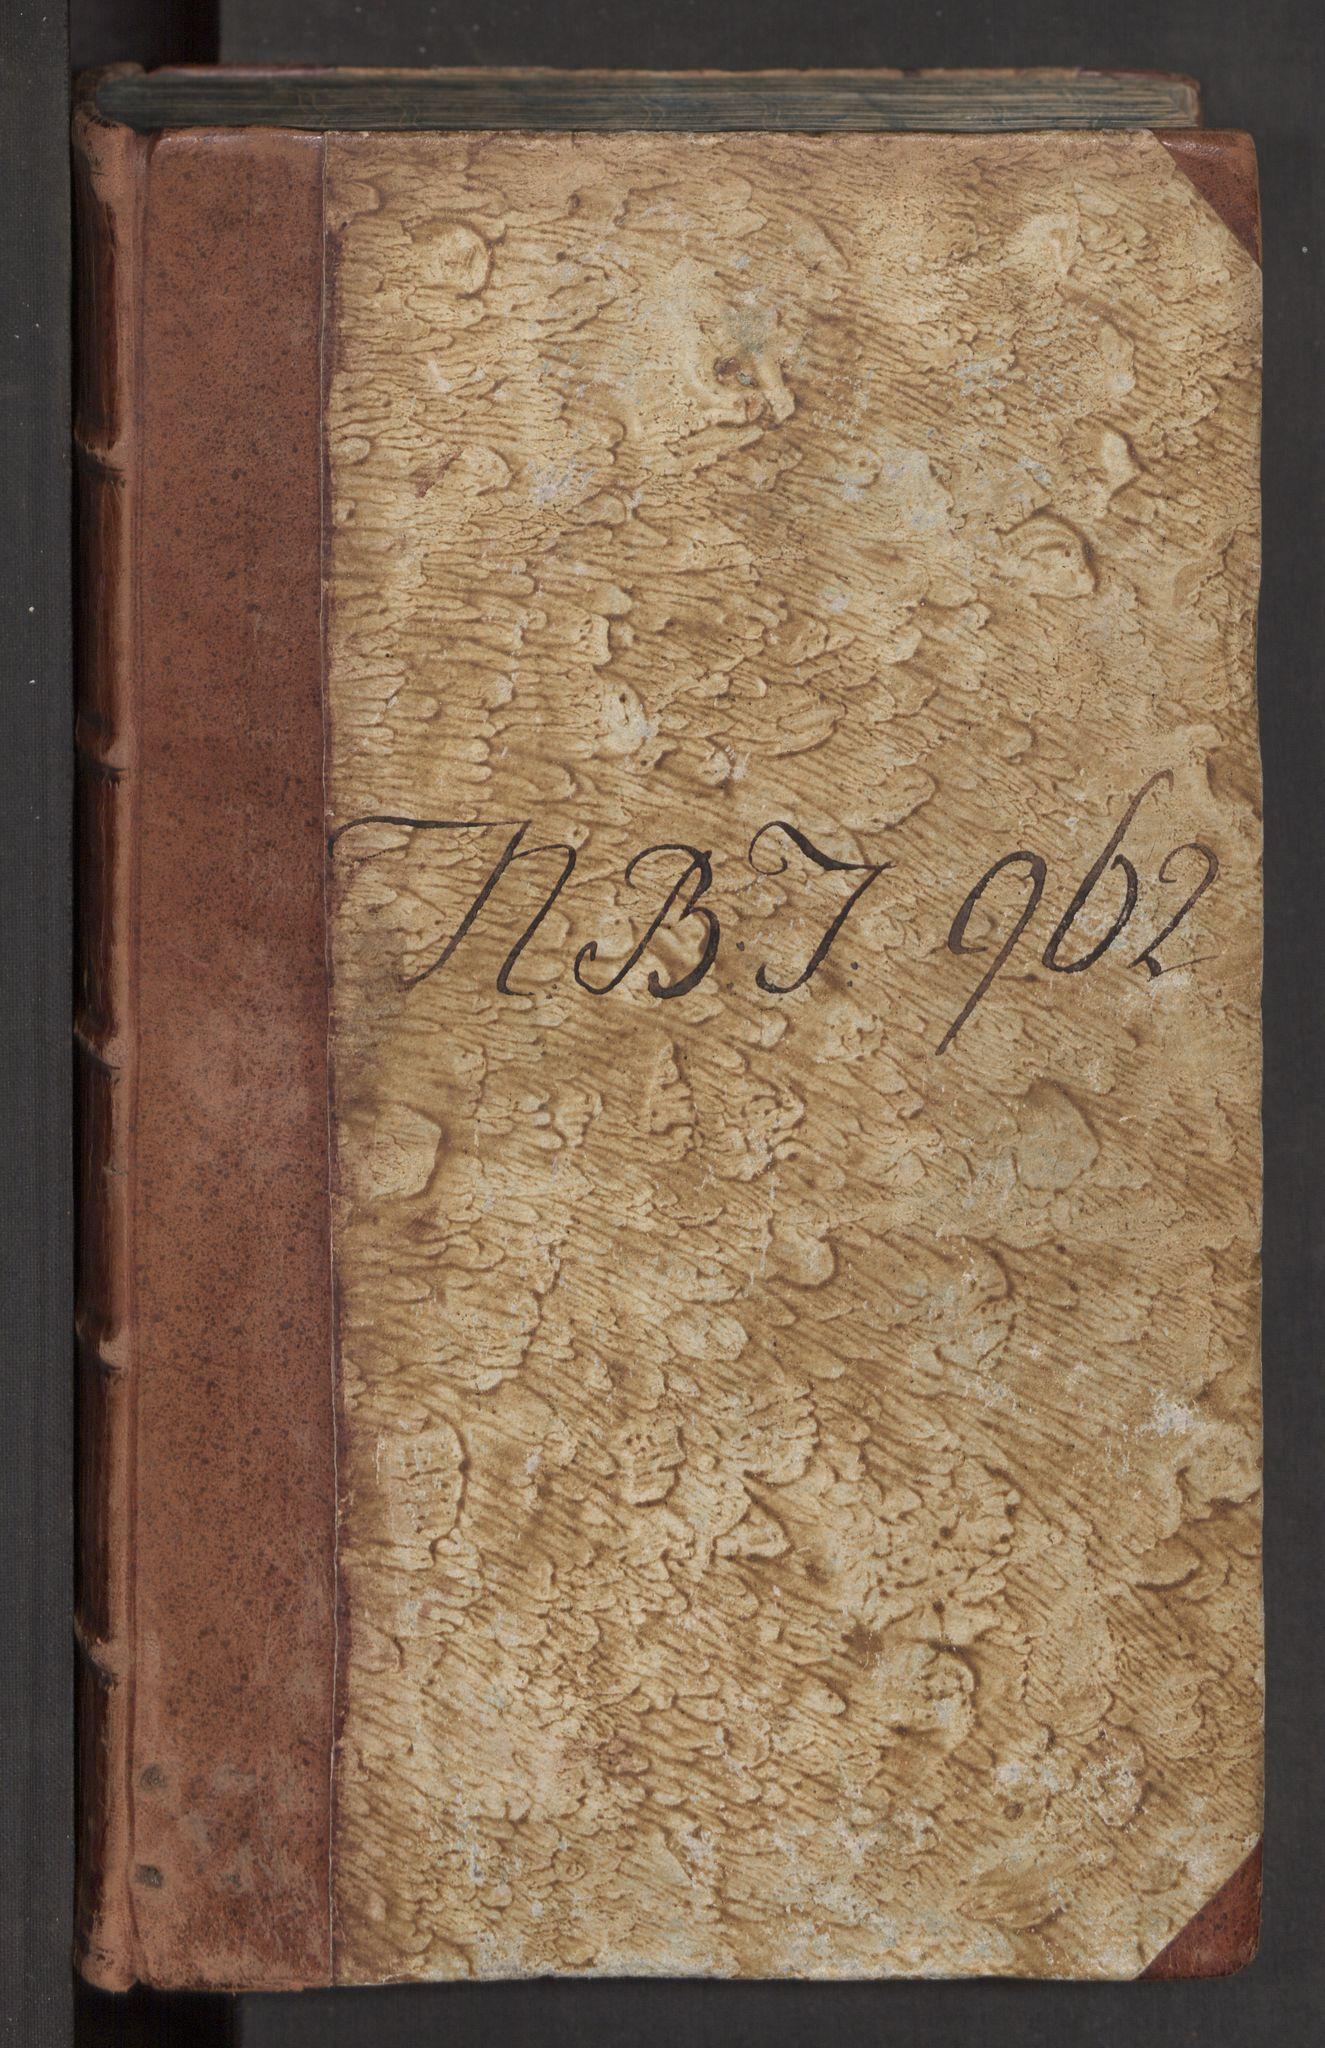 RA, Kommersekollegiet, Brannforsikringskontoret 1767-1814, F/Fa/L0009: Bragernes, 1797-1807